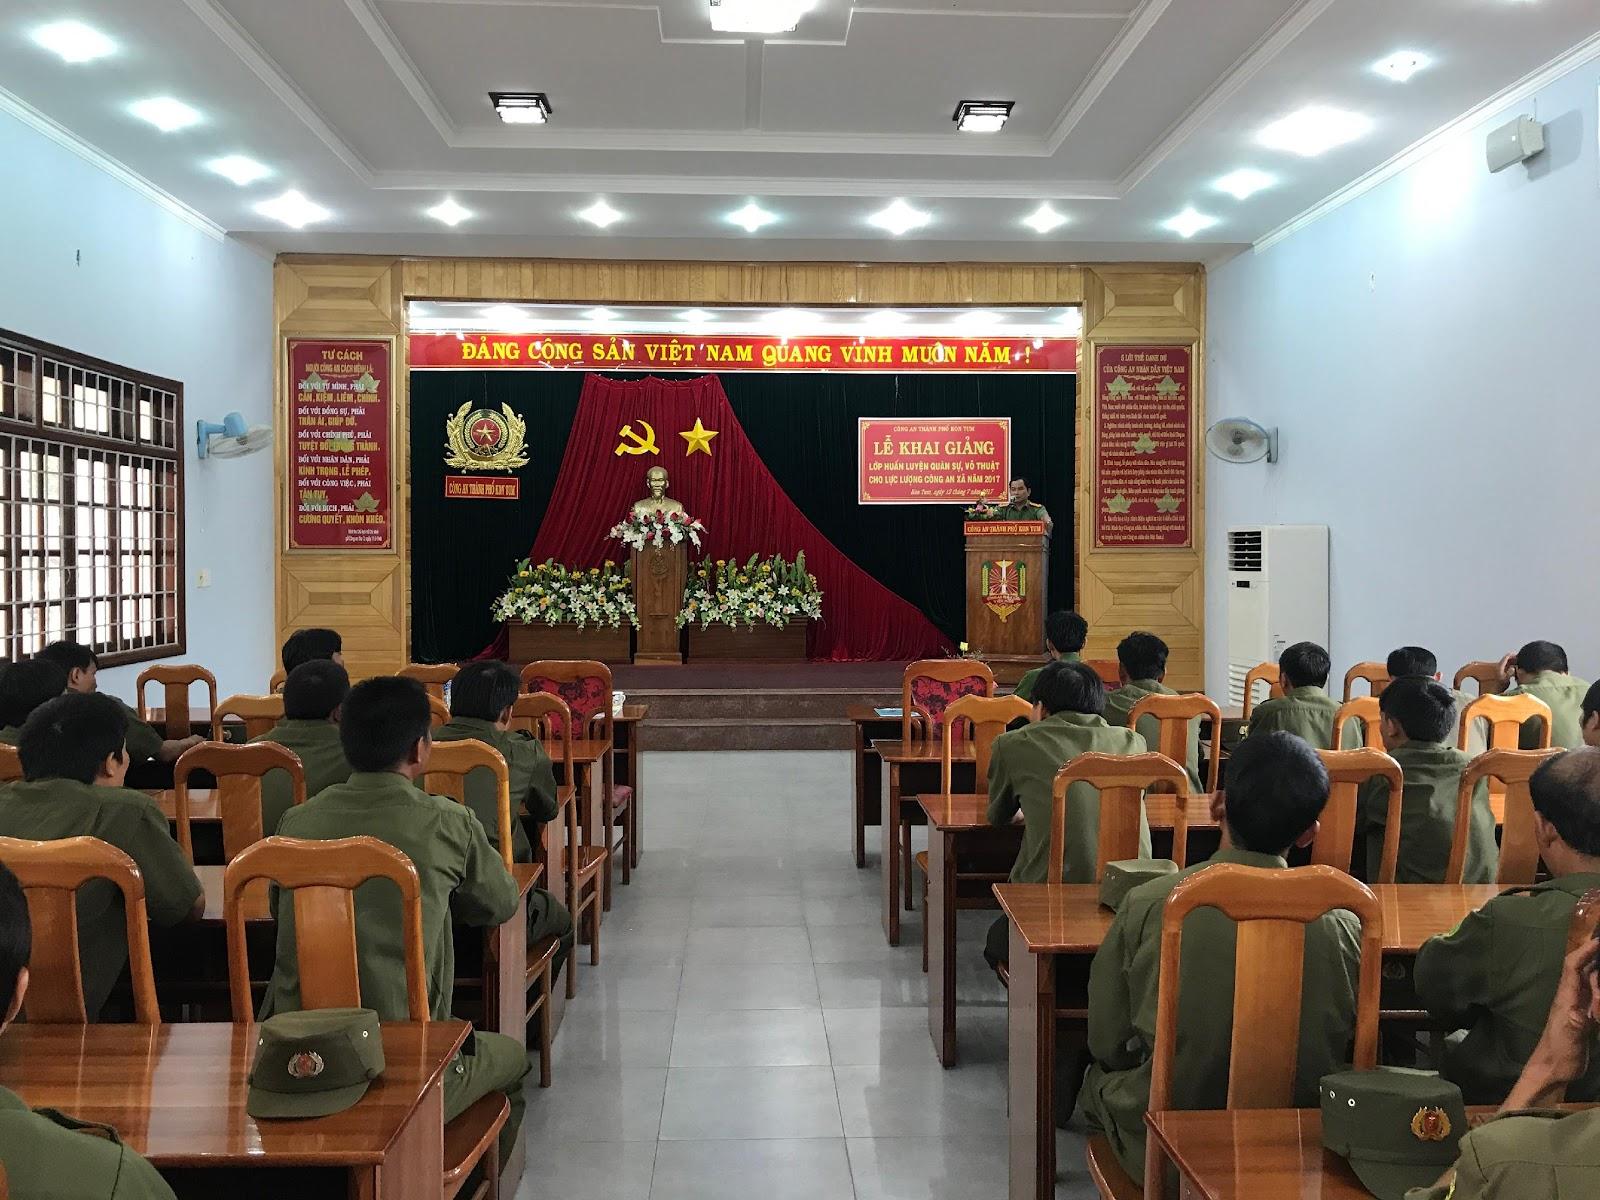 C:UsersPhu NguyenDownloads2F76E77F-0E9E-49A2-9857-94FE1FA1B12B.JPG